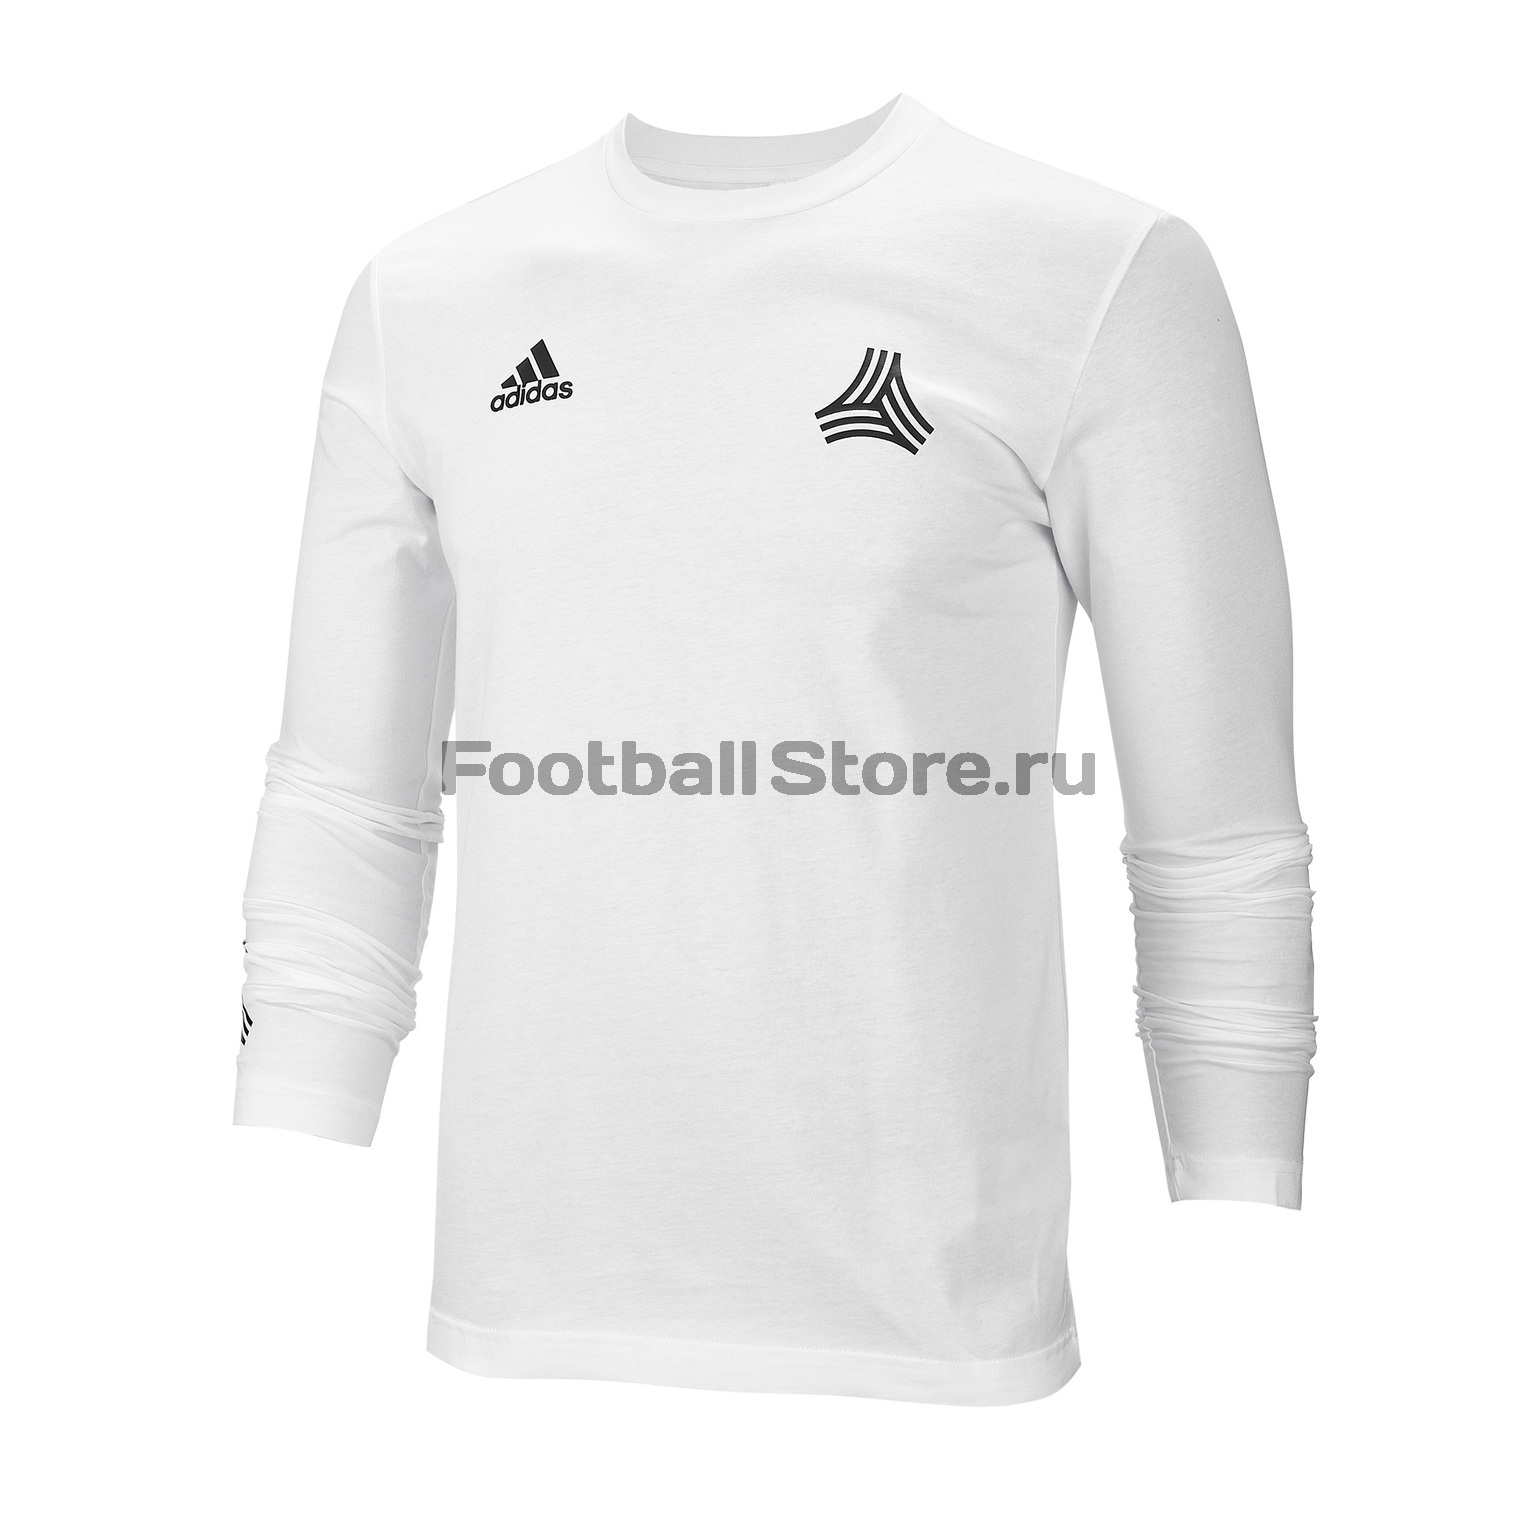 Футболка с длинным рукавом Adidas Tan Gr Tee LS DP2688 футболка с длинным рукавом asics 156859 0904 man long sleeve tee